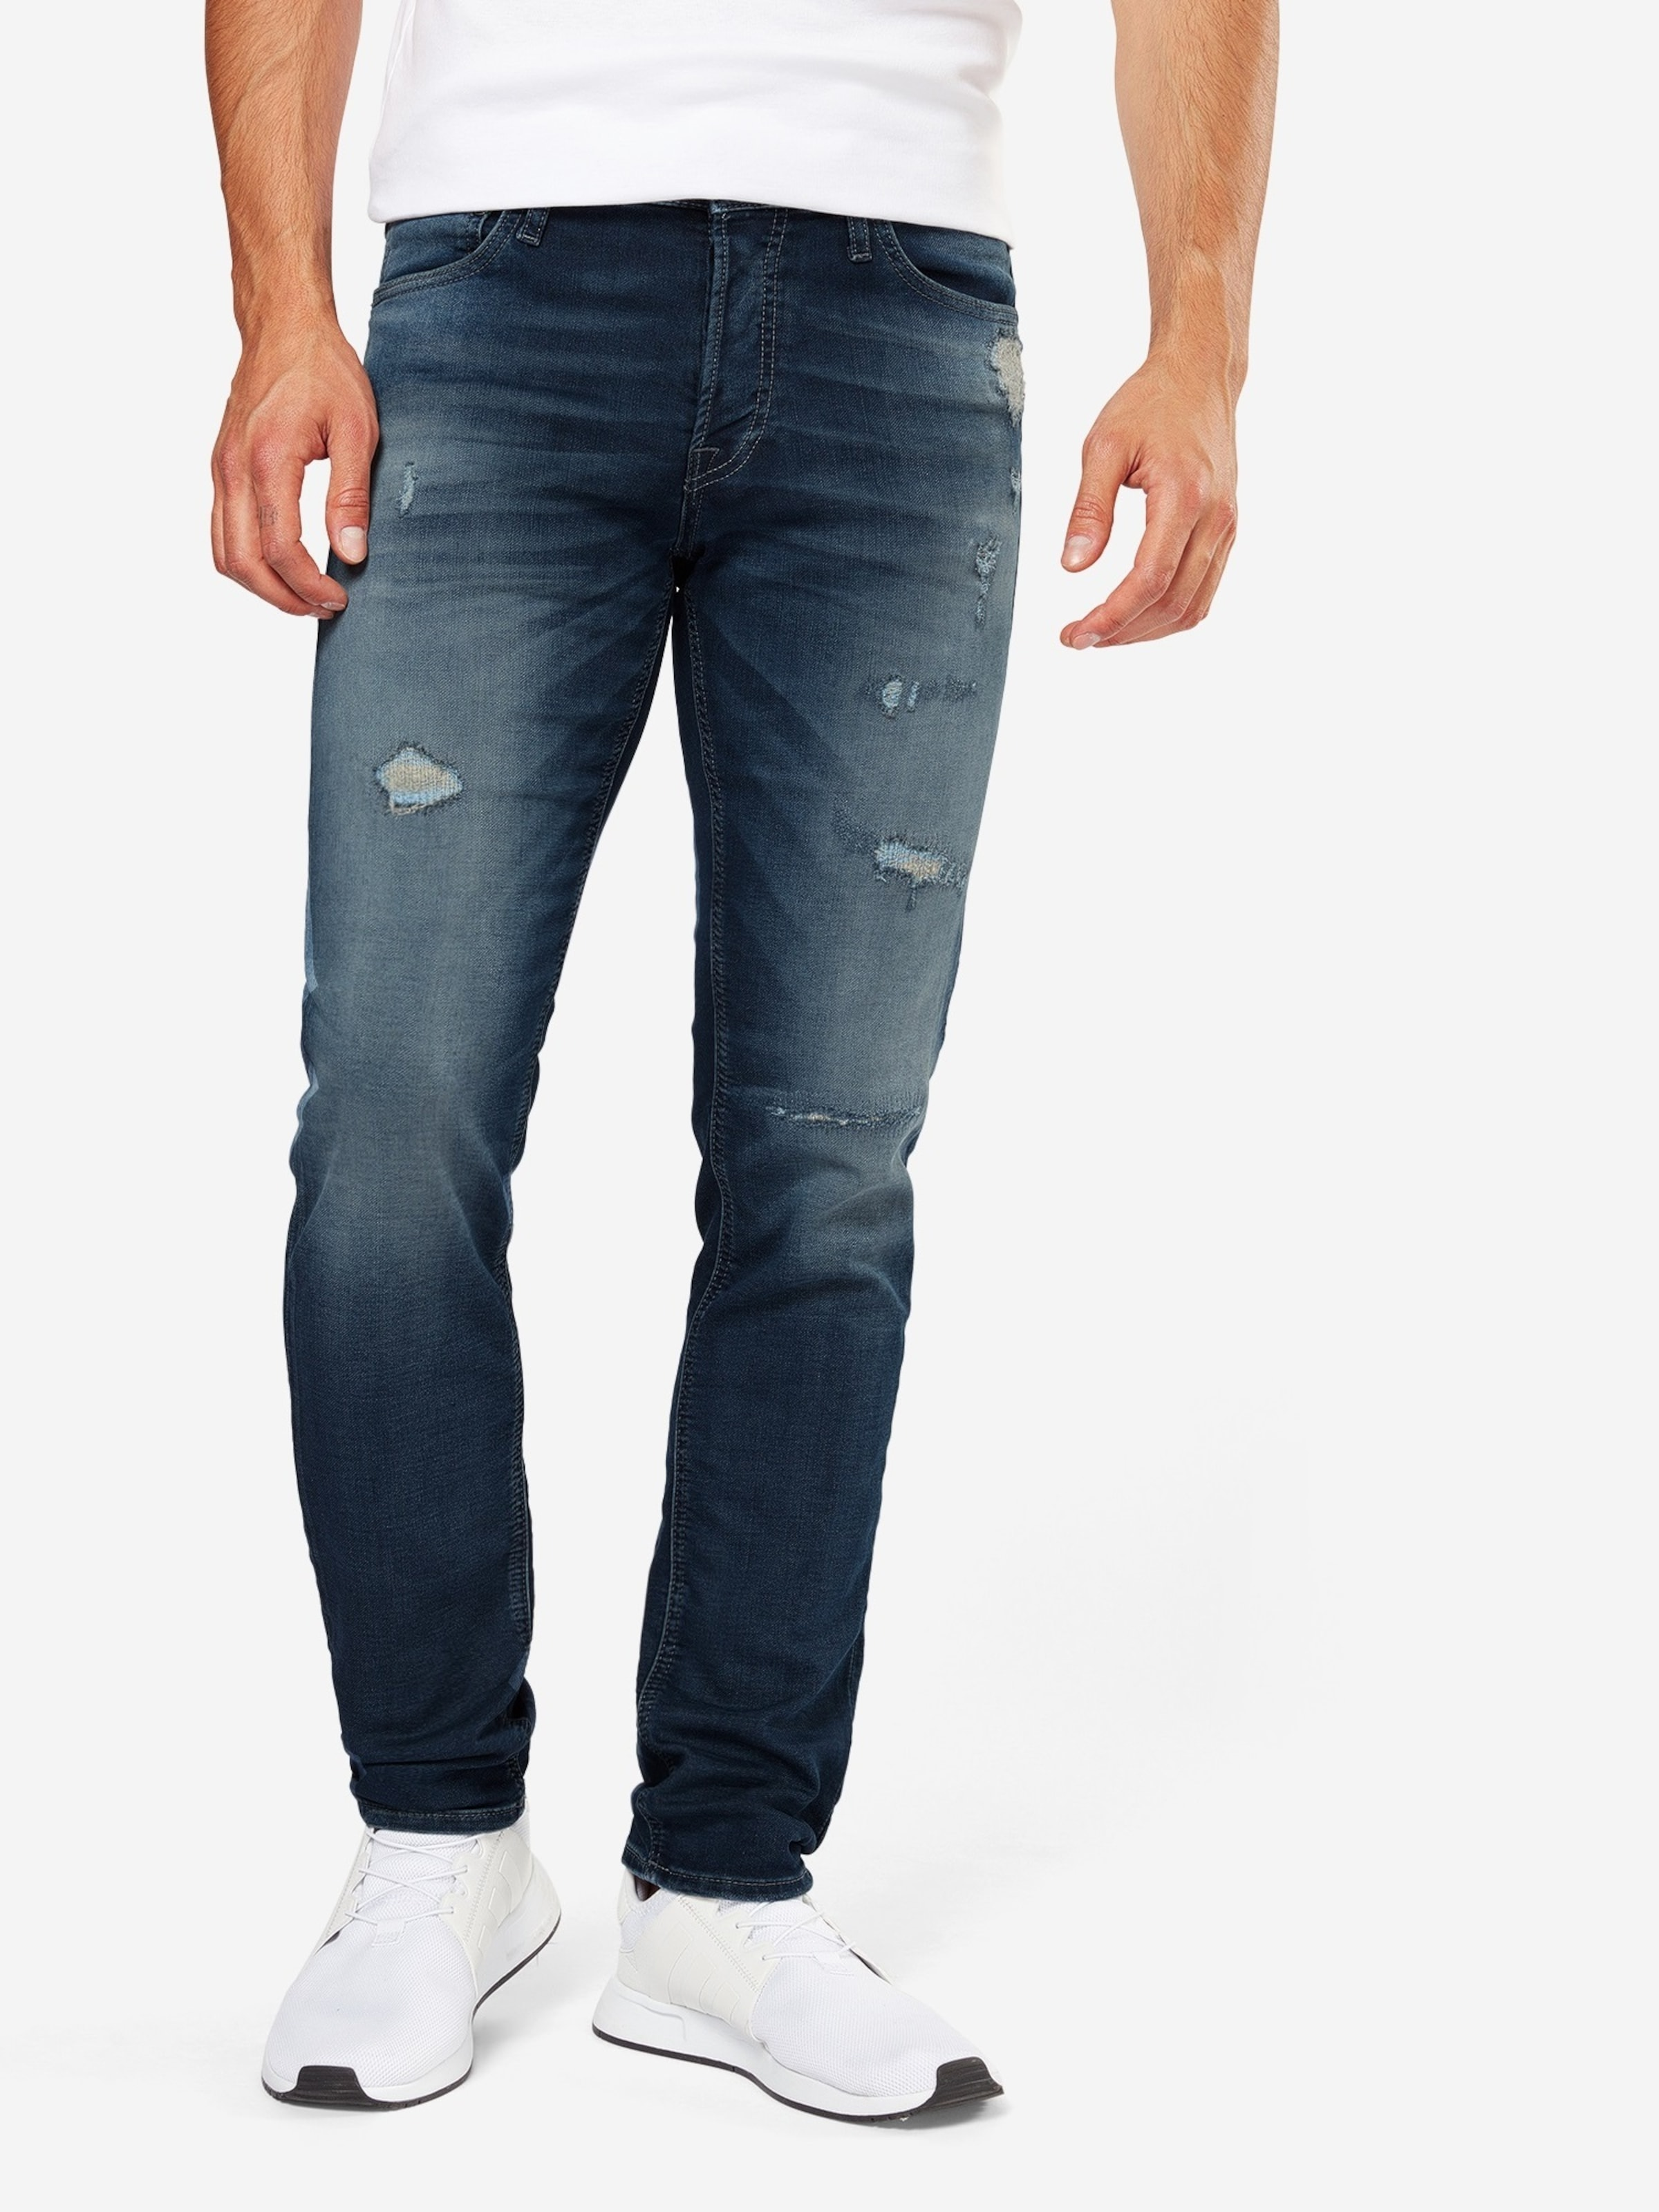 Billig Mit Paypal Manchester Online JACK & JONES Jeans 'JJIGLENN JJORIGINAL JOS 118 ID.K NOOS' Angebote 5uOzGVVs